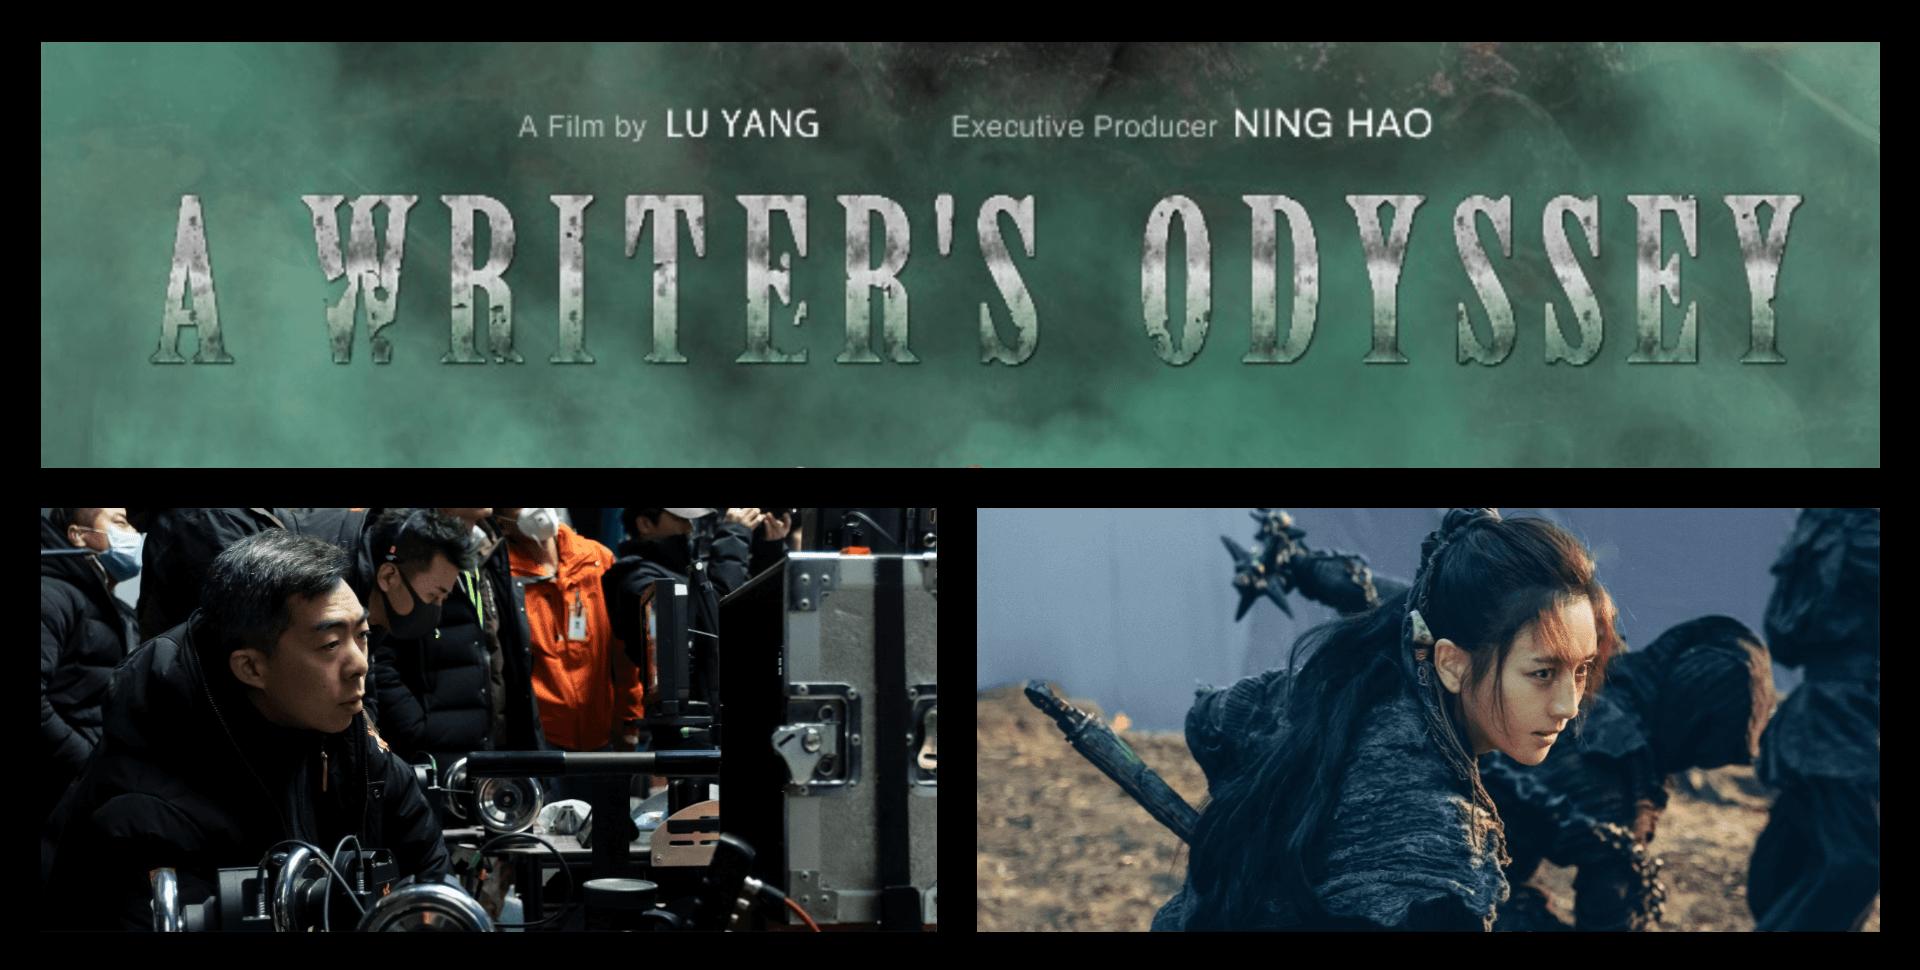 Lu Yang -interview - A Writer's Odyssey